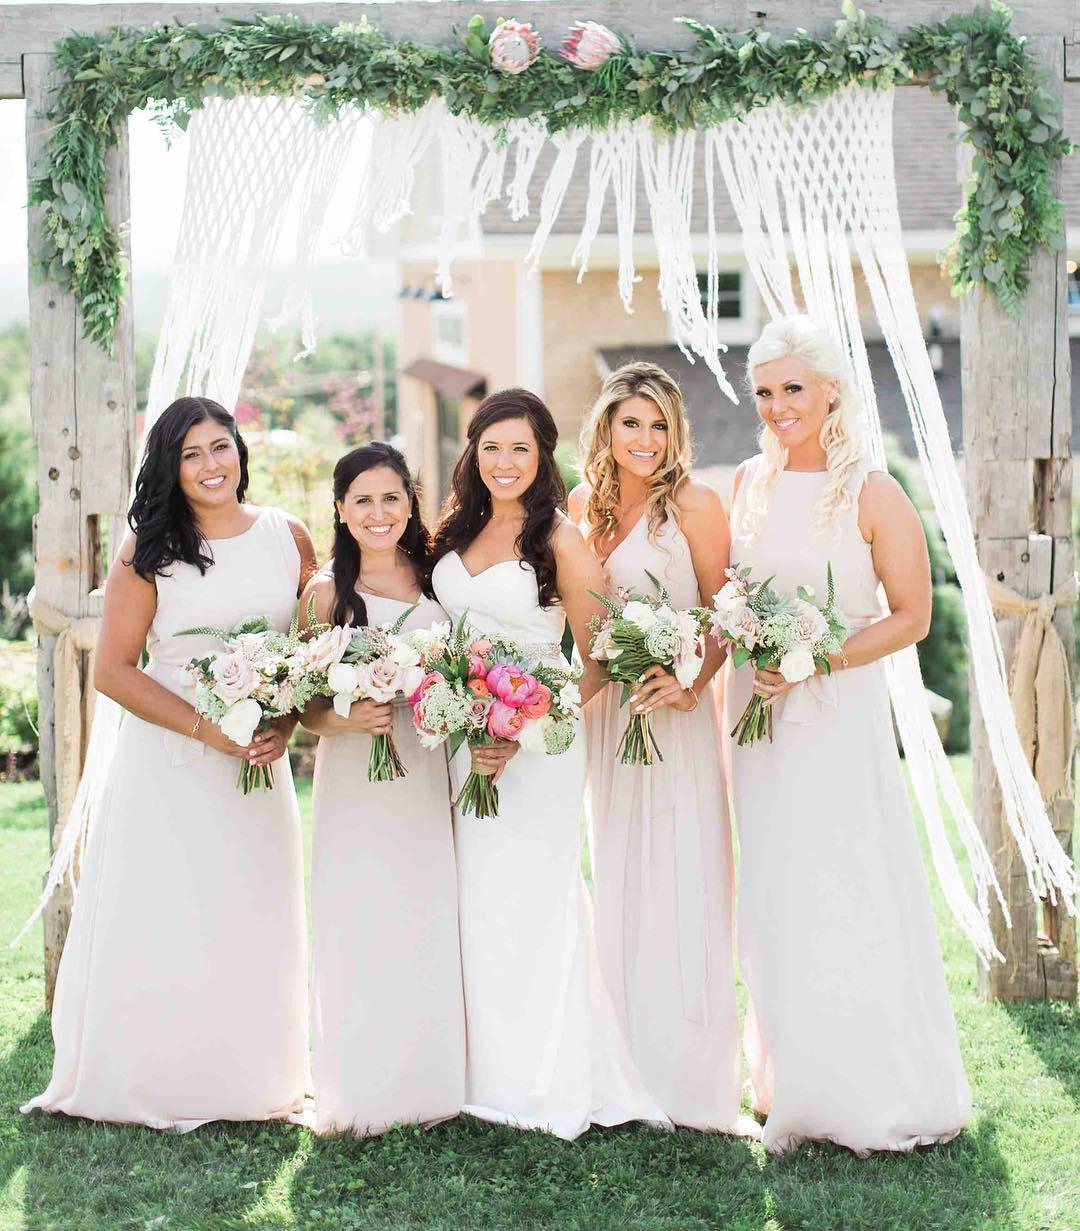 {gorgeousness} photo | @jharperphoto . . . #brideandhergirls #lovelies #sopretty #lovethis #arbor #bouquets #bohostyle #greenerygarland #boho #barnwedding #lotusfloraldesigns #weddingflorist #love